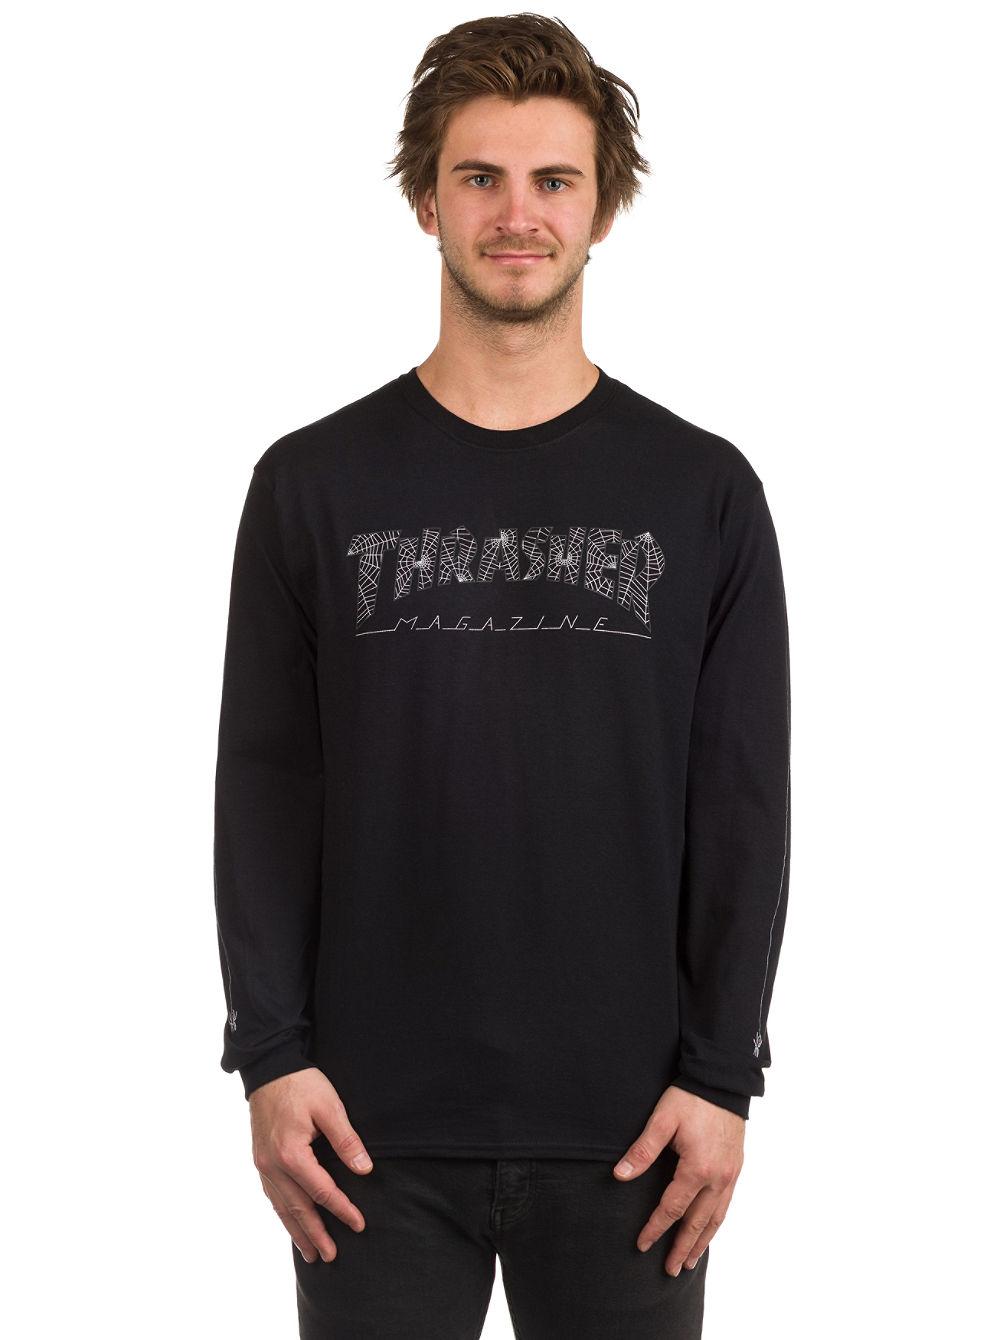 78f6c545aca8 Buy Thrasher Web Long Sleeve T-Shirt online at Blue Tomato